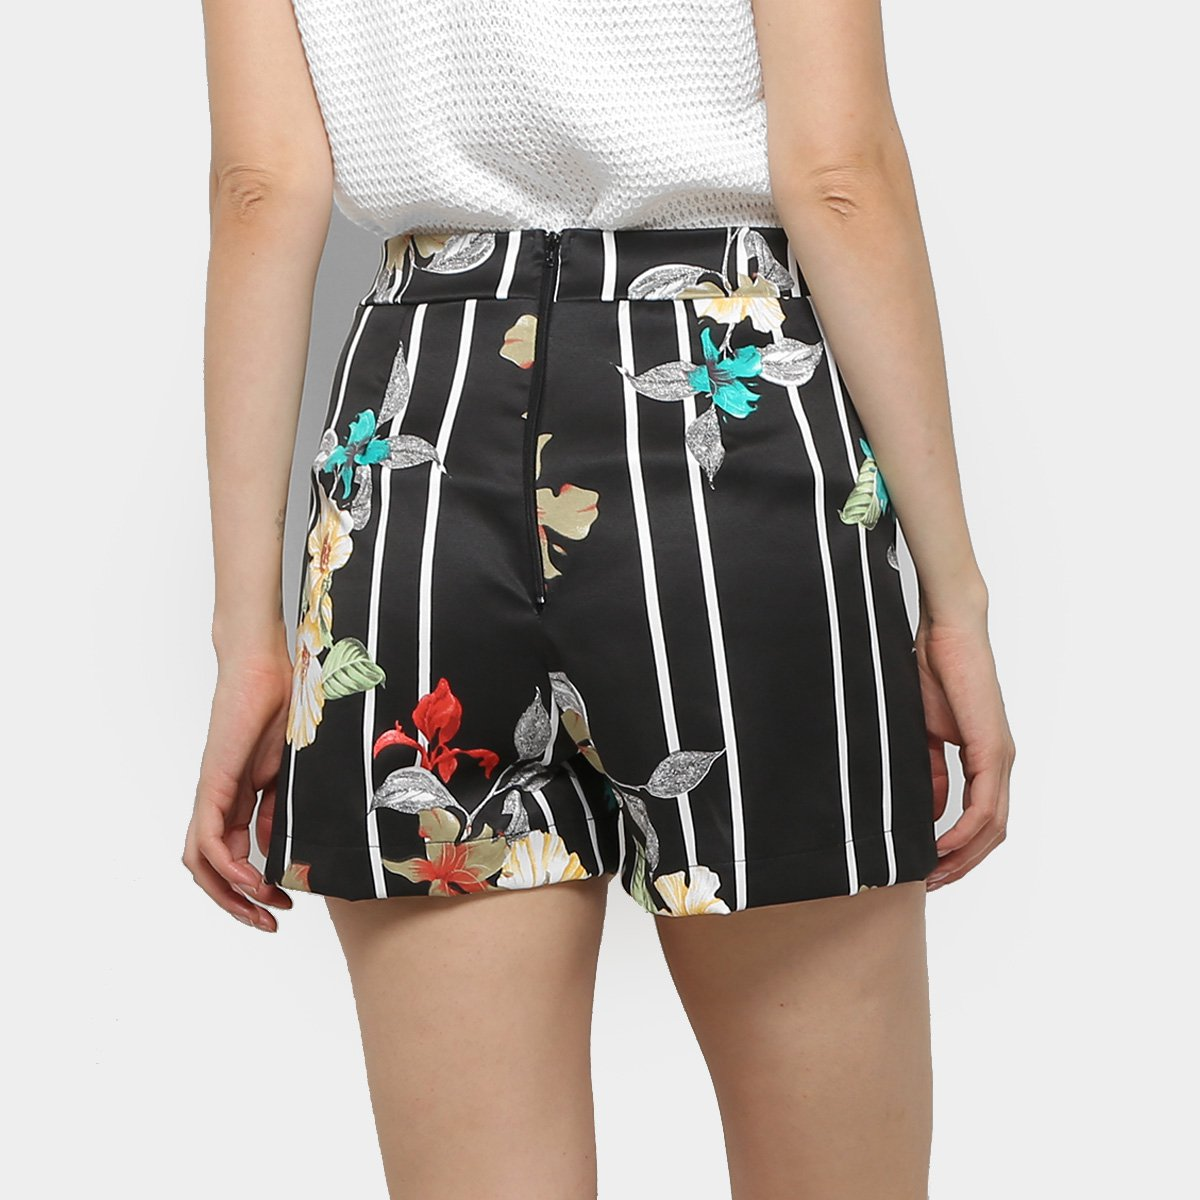 Foto 2 - Shorts Mercatto Hot Pants Listrado Floral Feminino